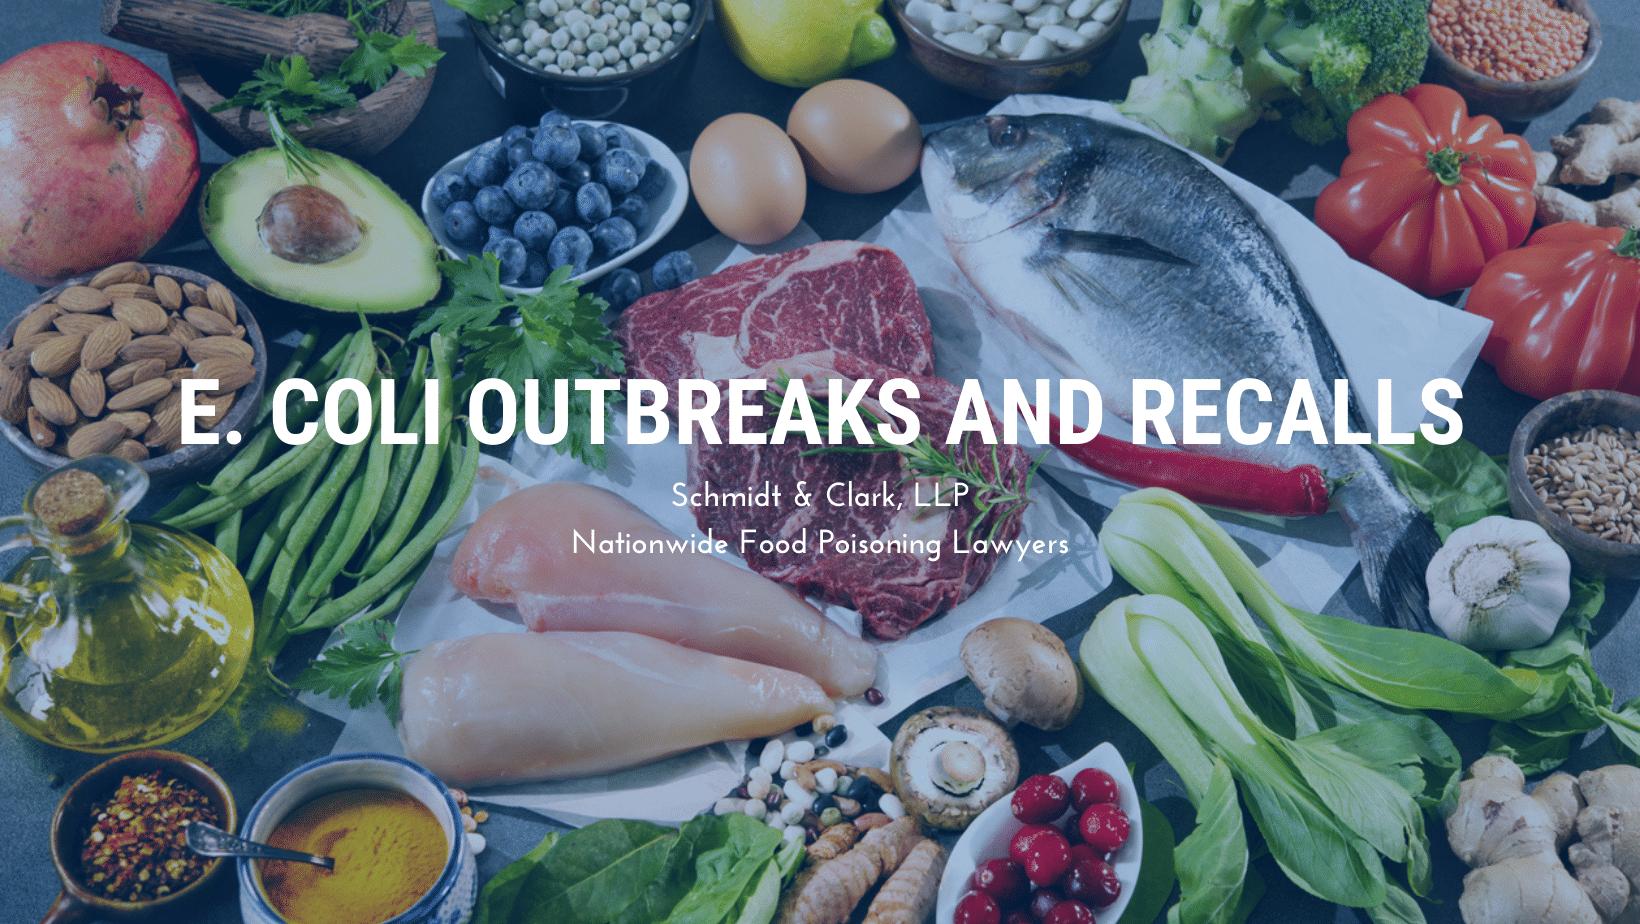 E. Coli Outbreaks and Recalls